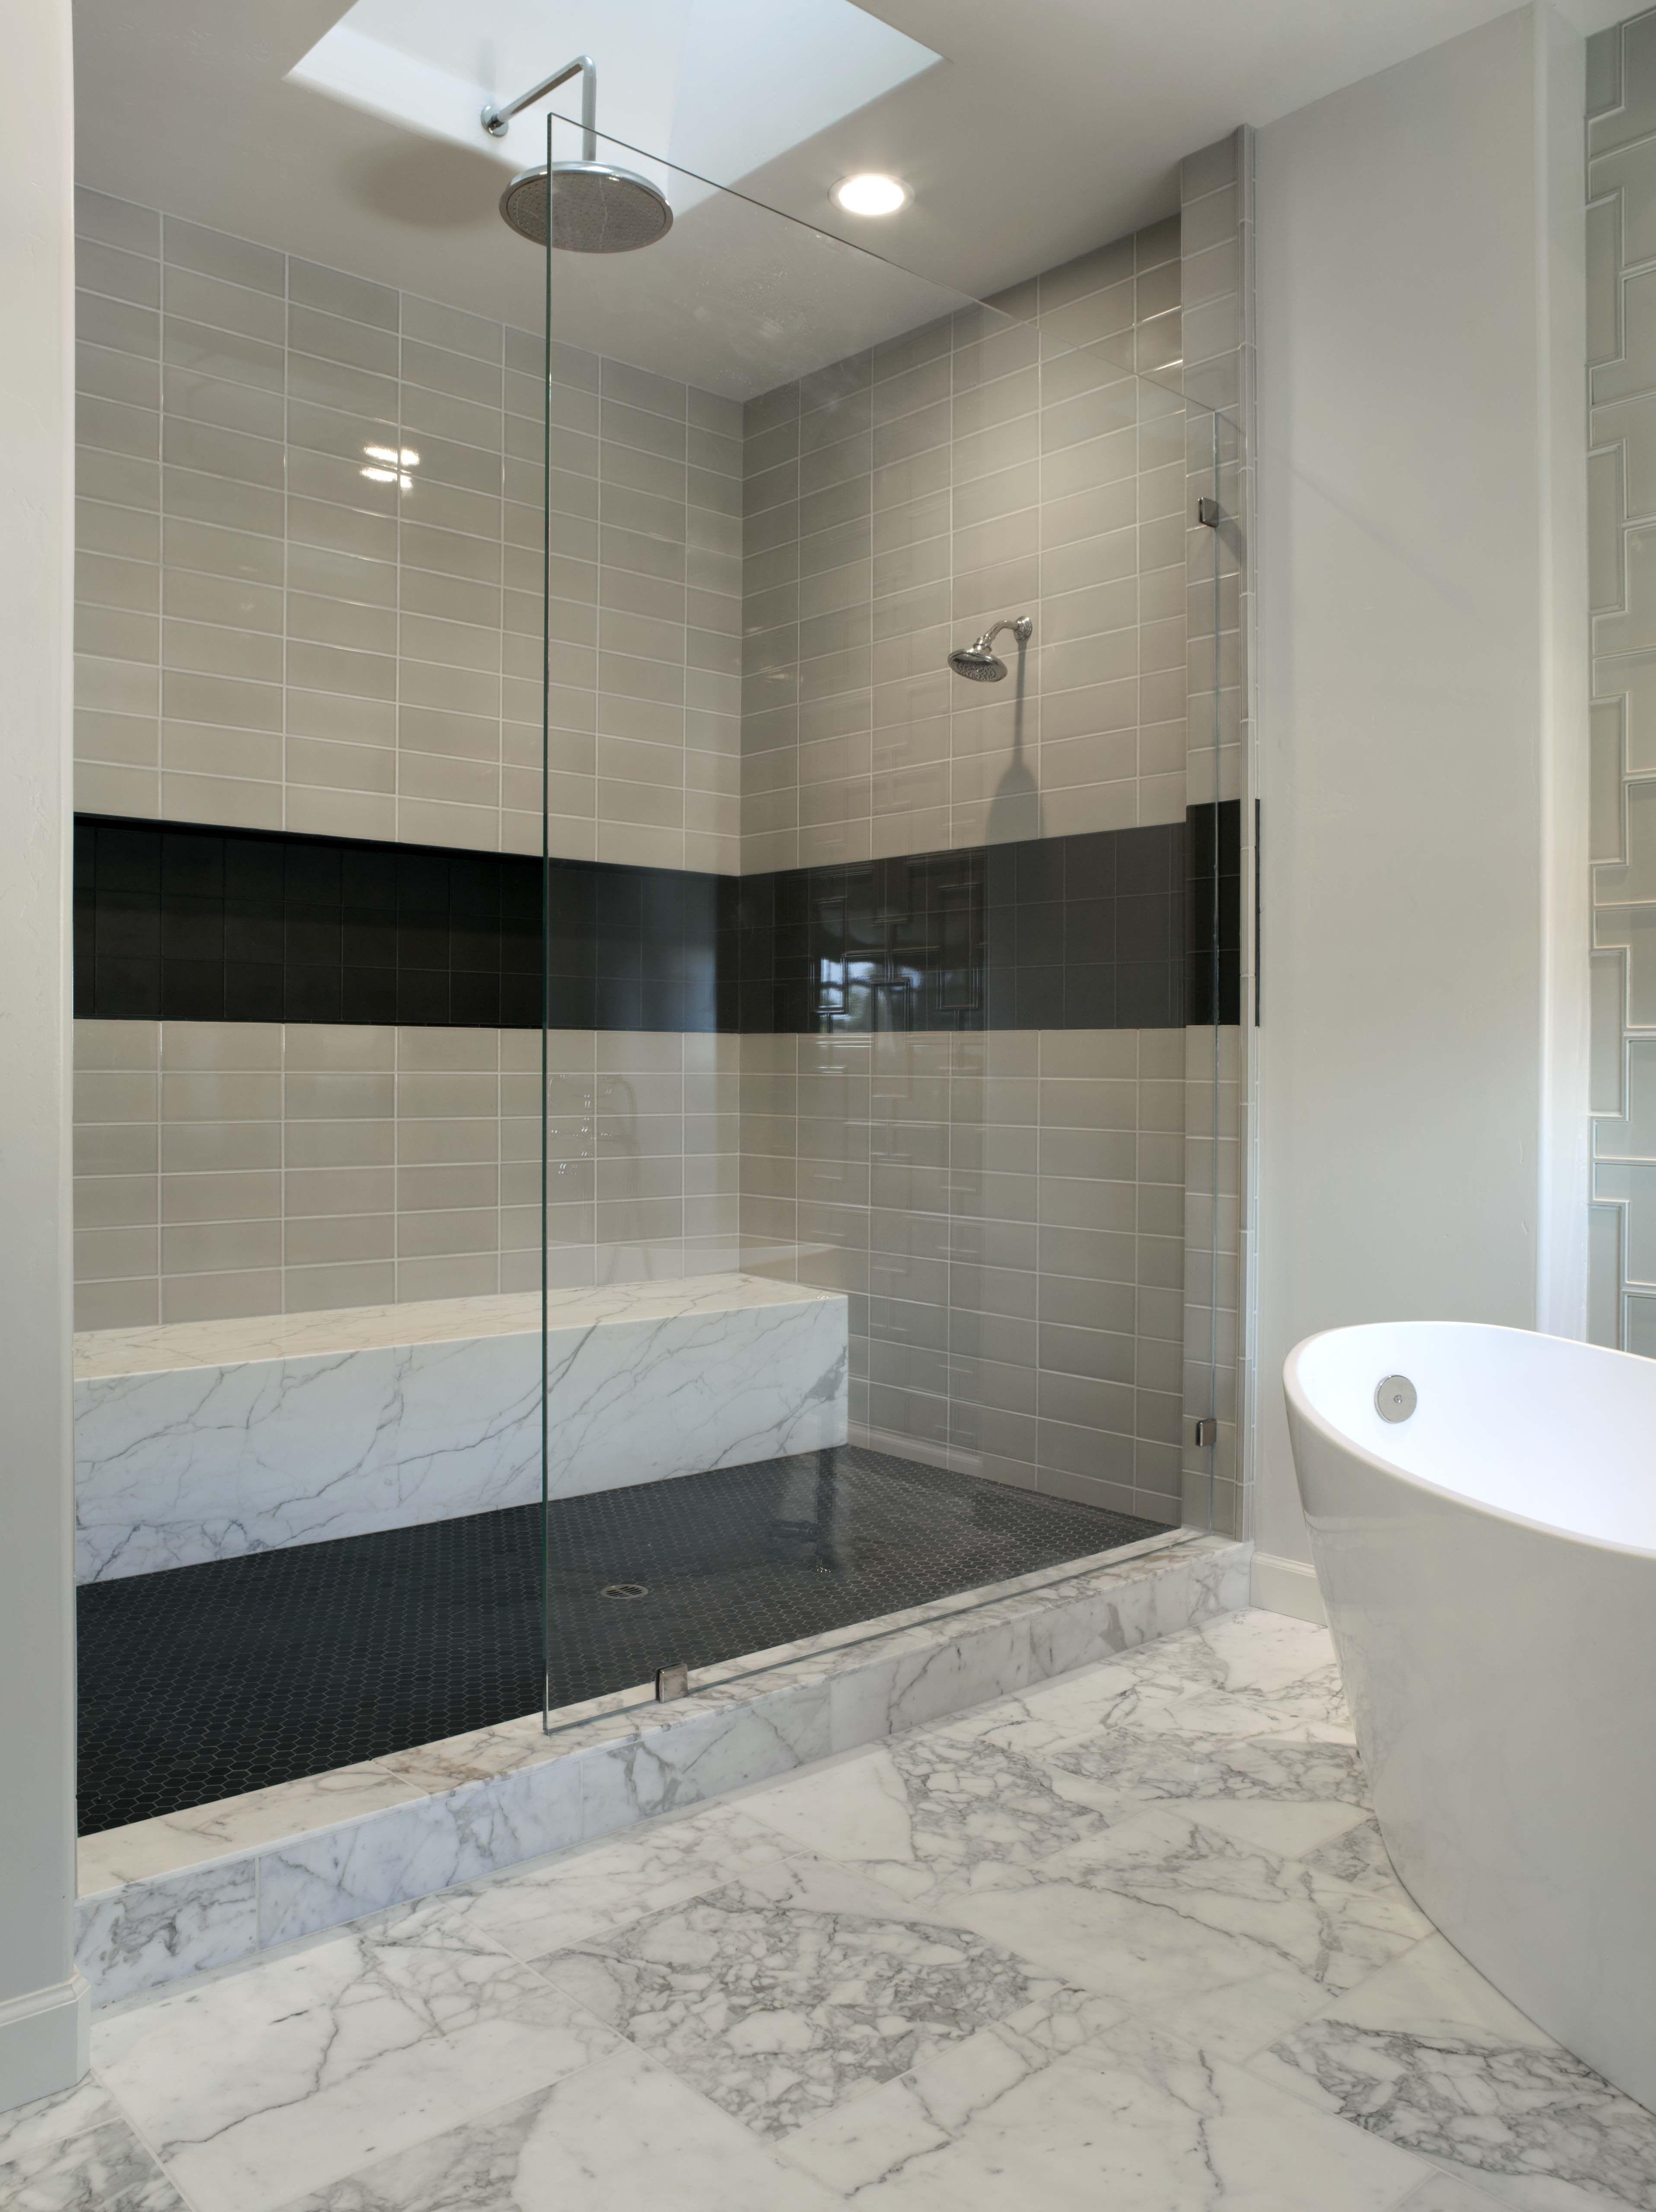 20 Functional Cool Bathroom Tile Ideas Kamar Mandi Mandi Lantai